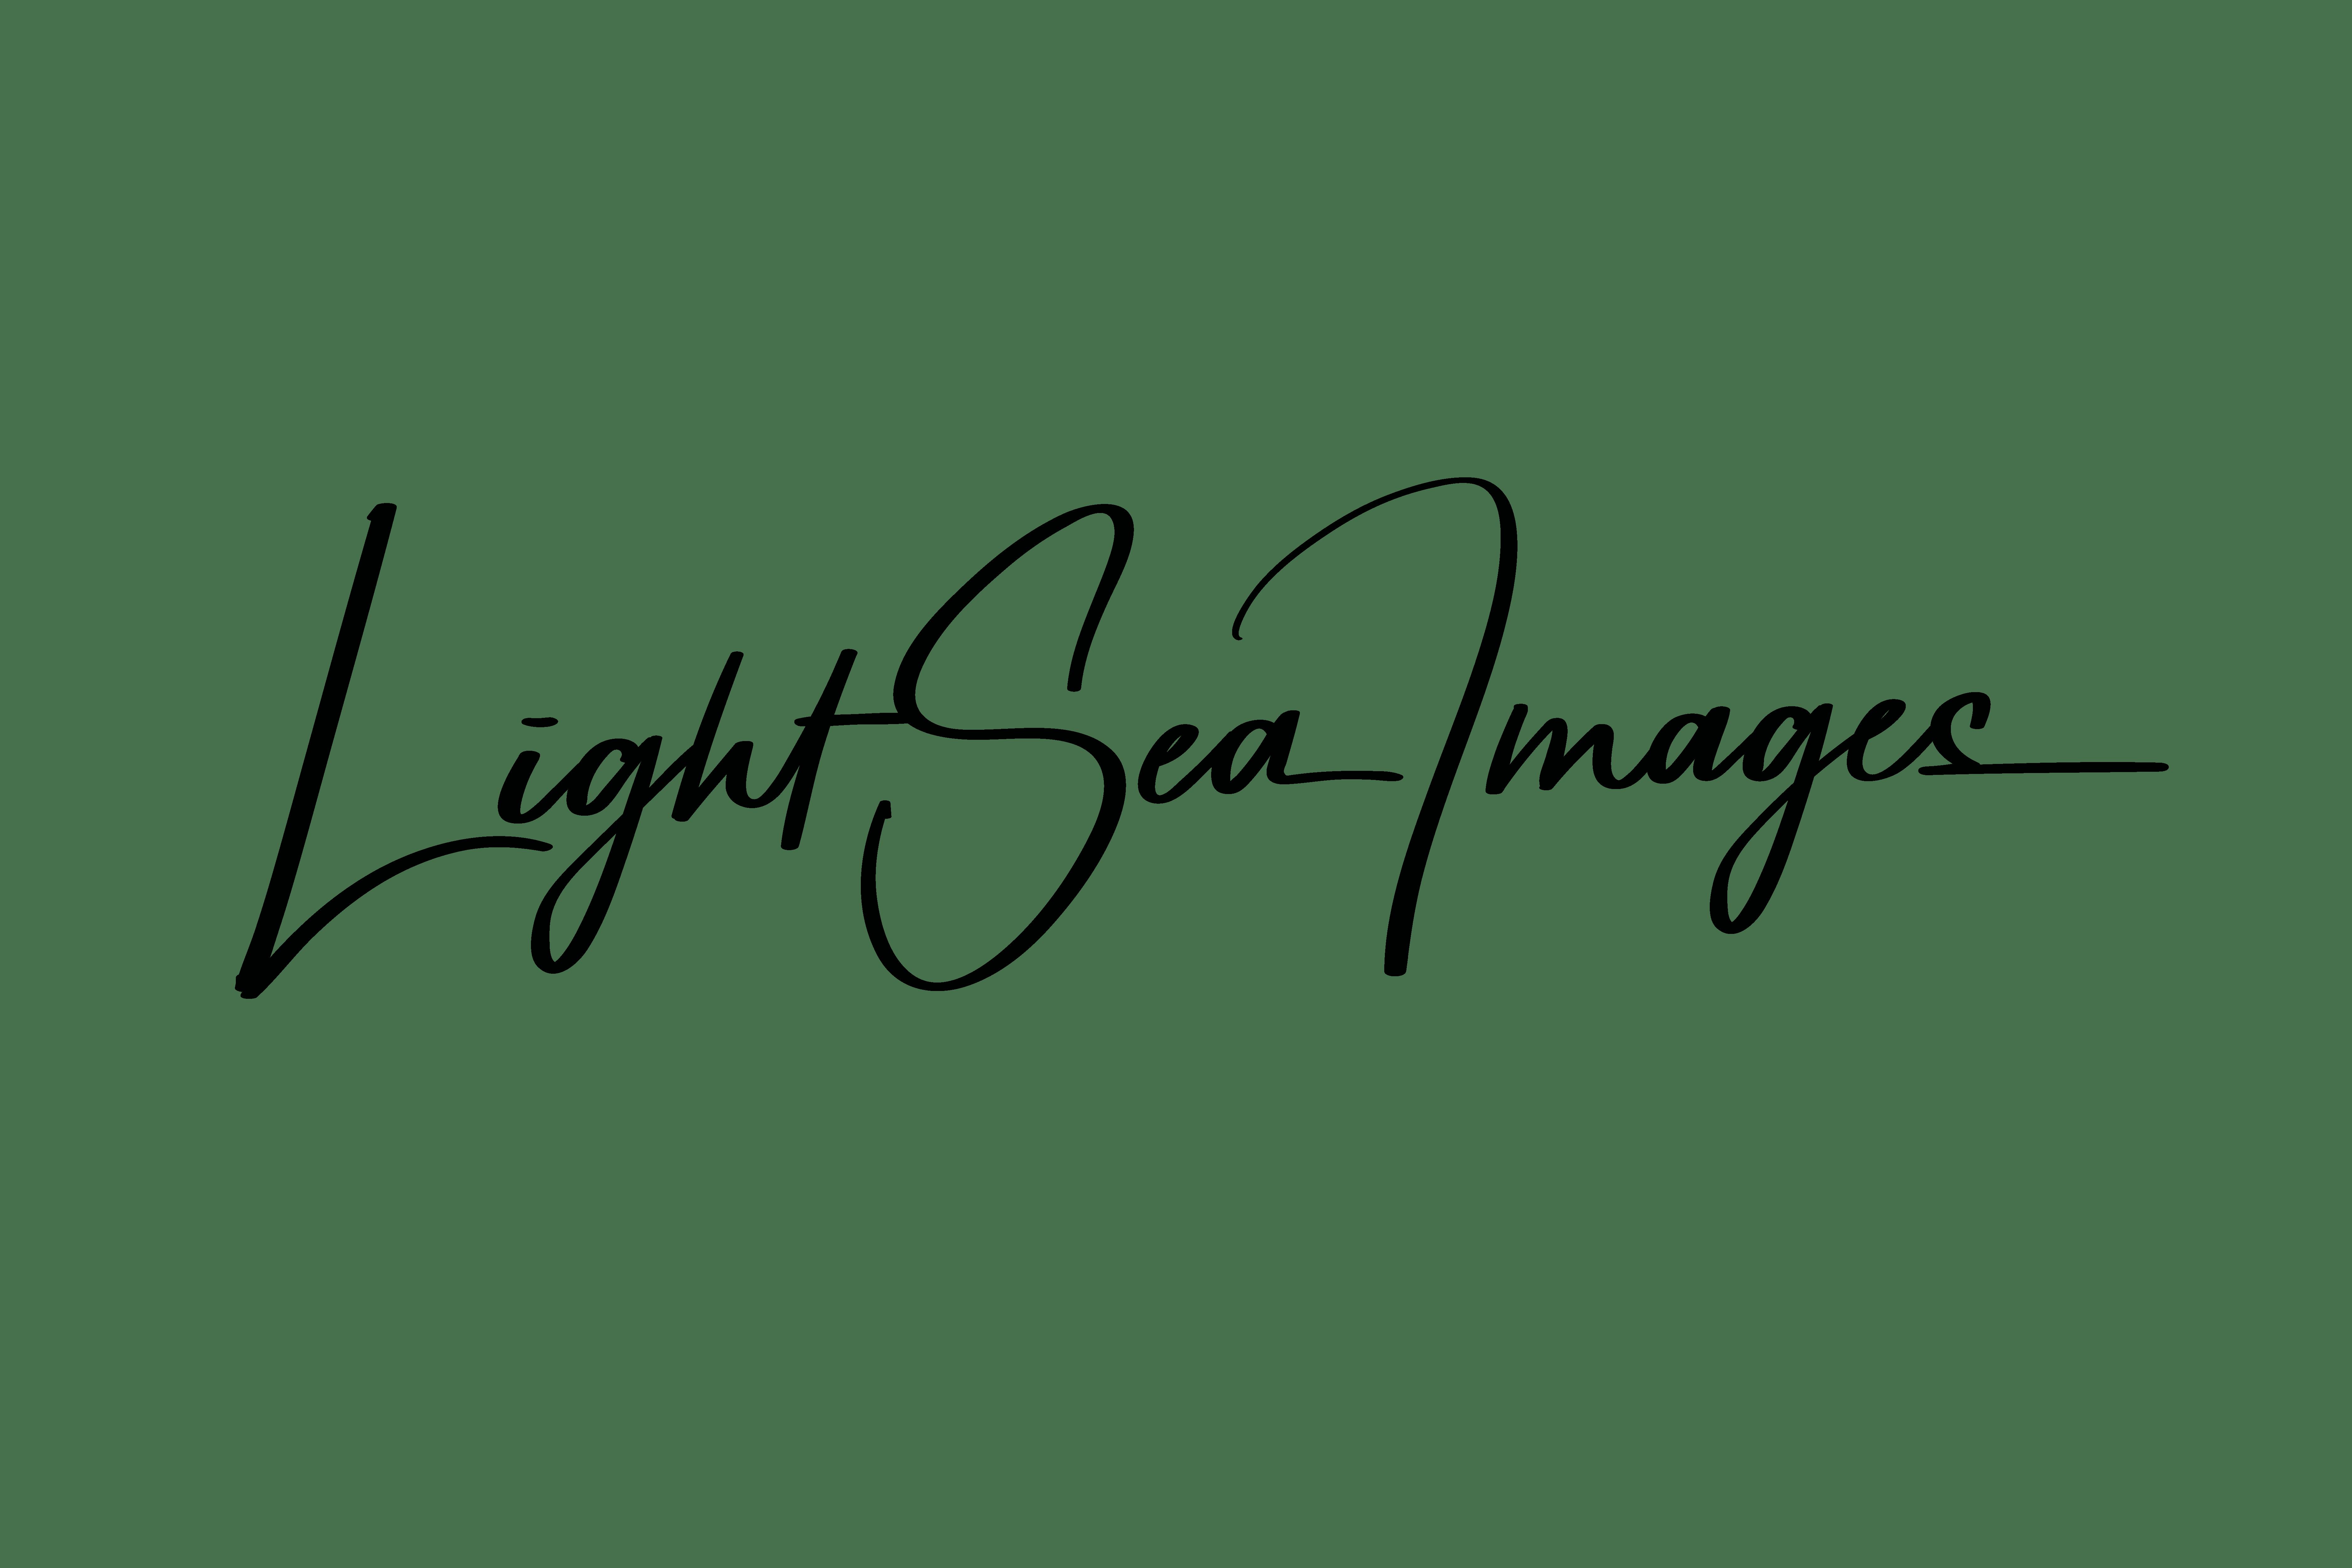 lightseaimages